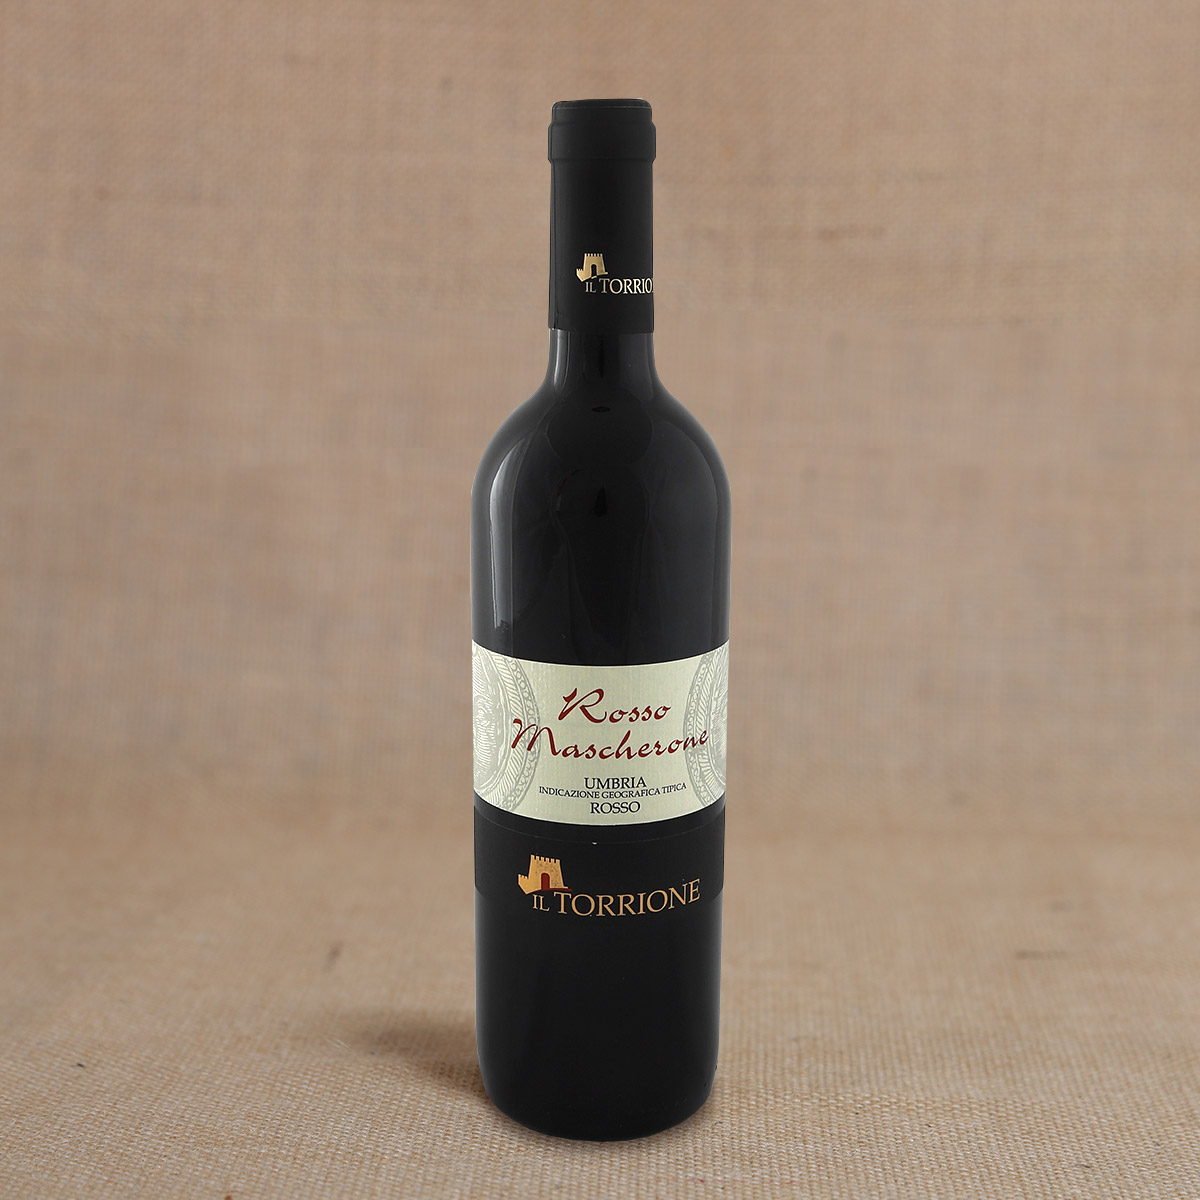 vino-rosso-mascherone-il-torrione-sapori-terra-umbra